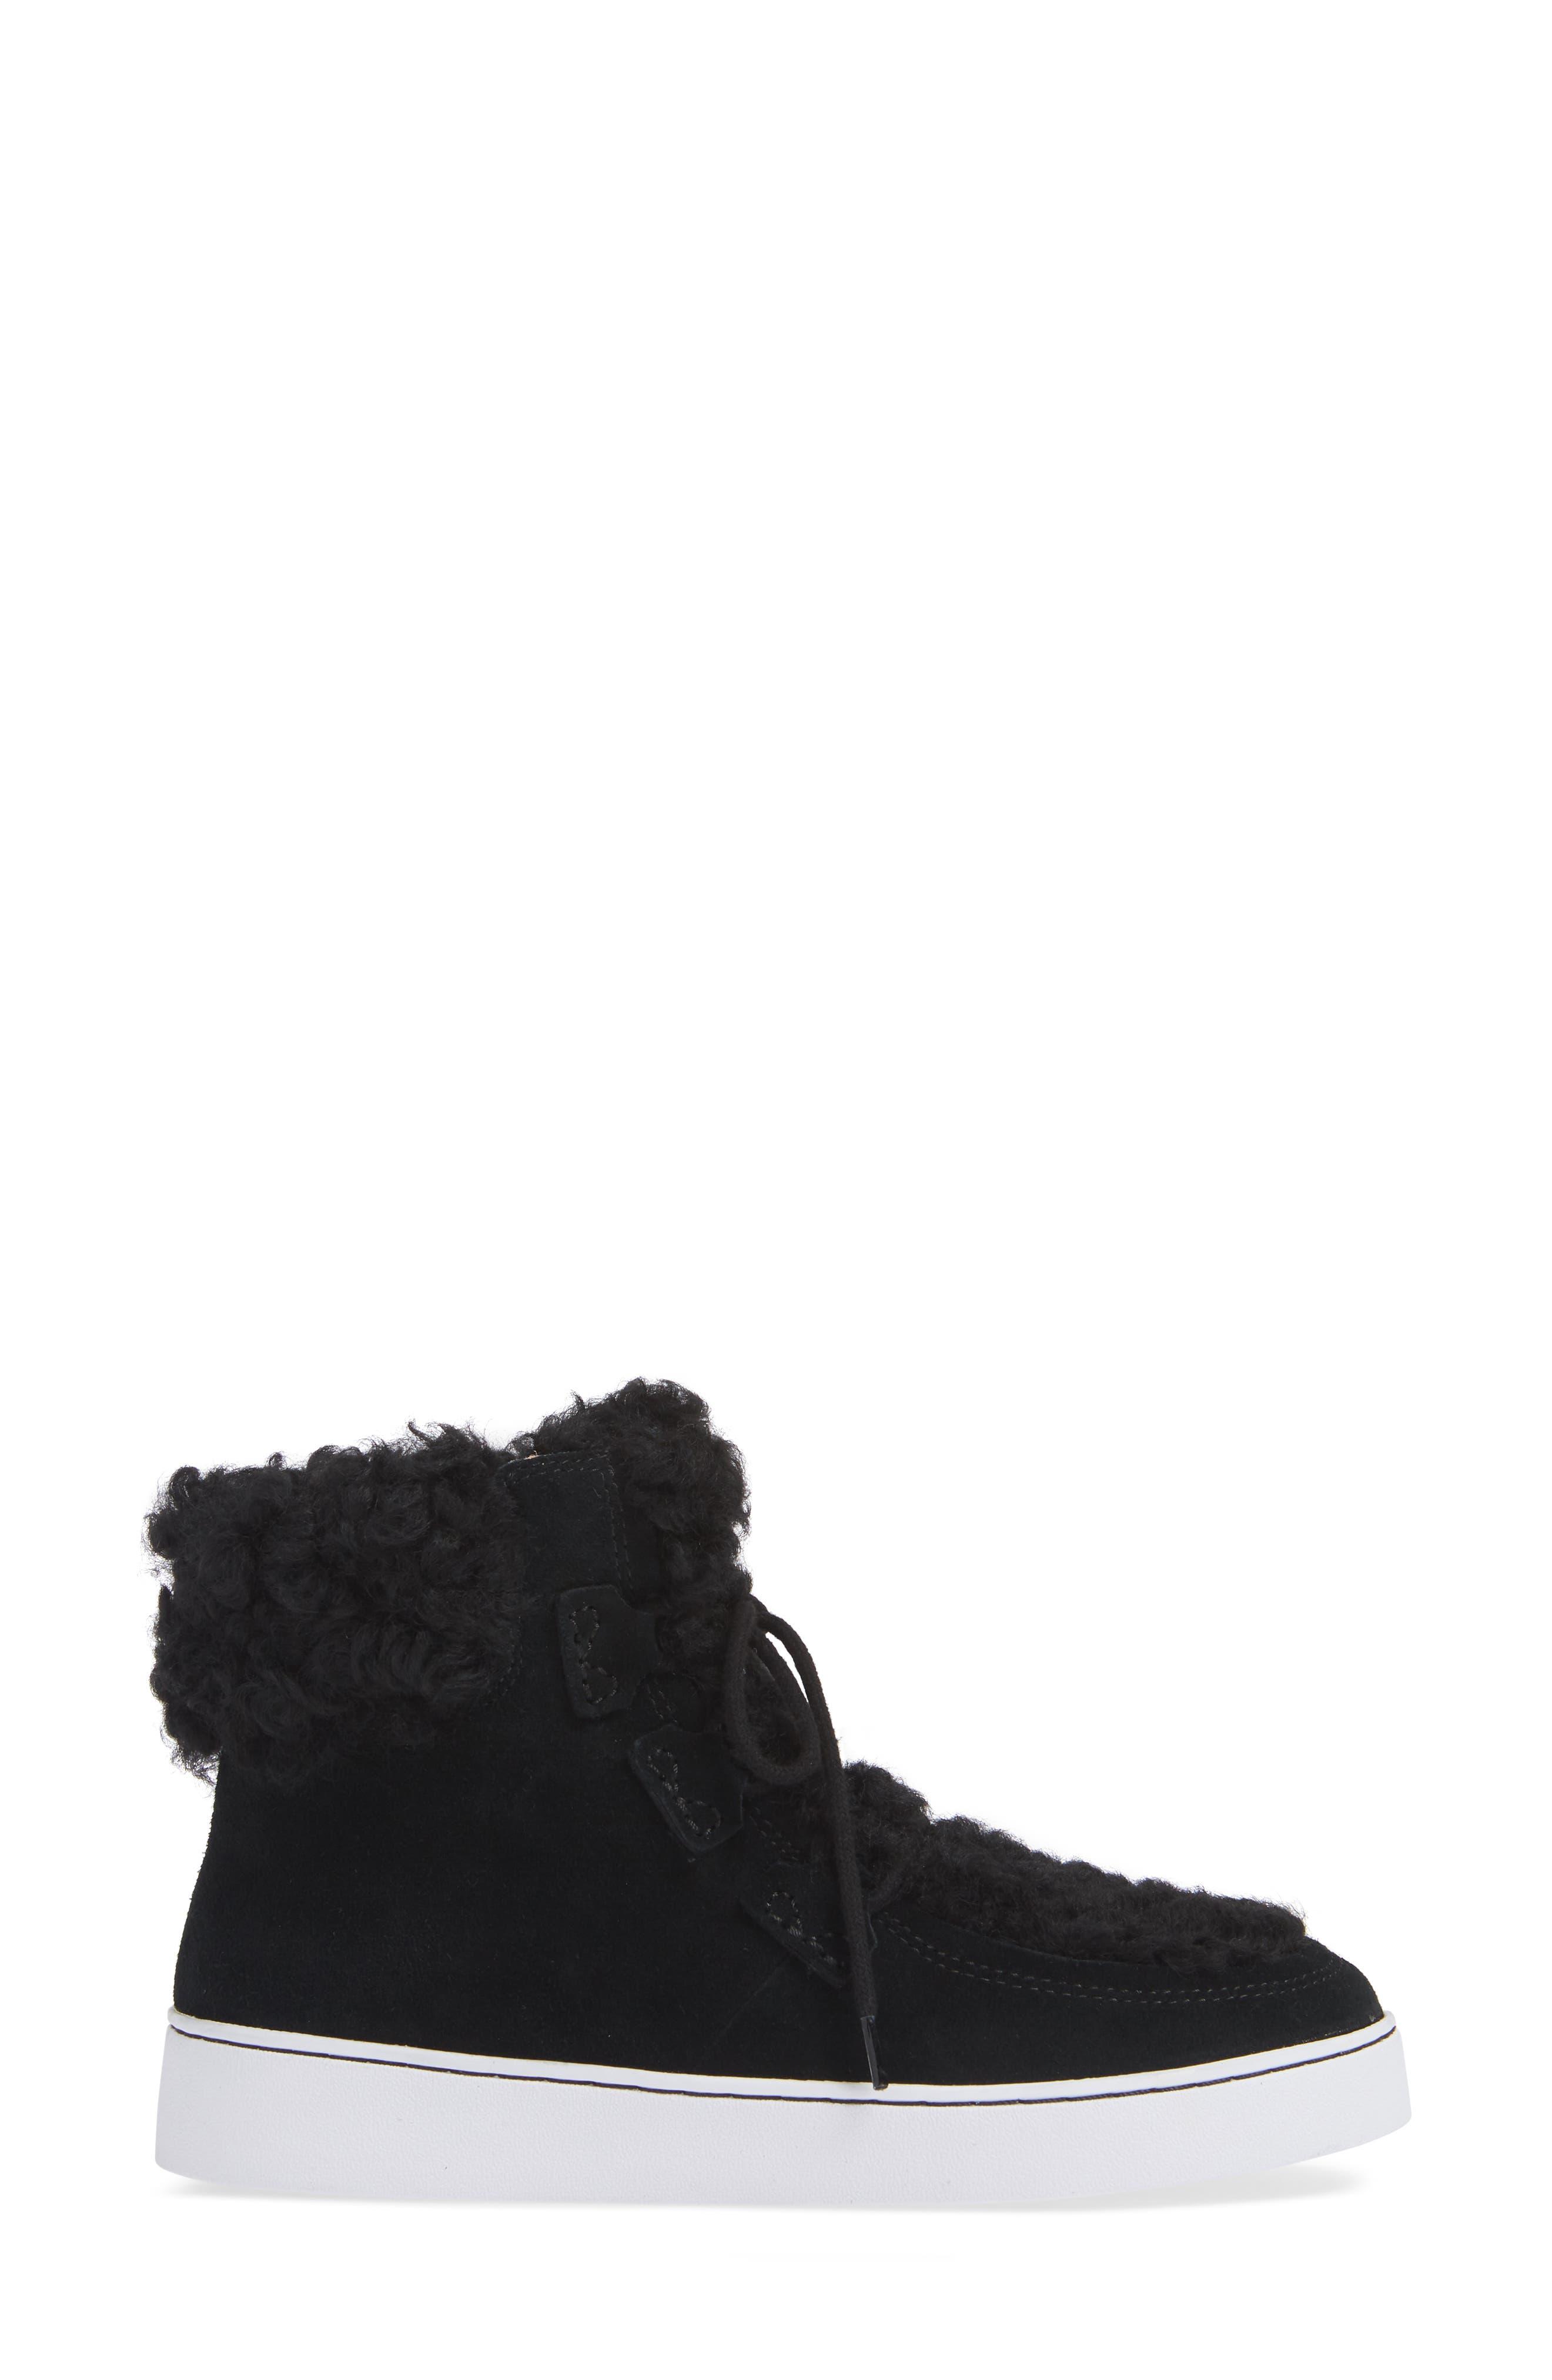 Oak Genuine Shearling Cuff Sneaker Bootie,                             Alternate thumbnail 3, color,                             BLACK SUEDE